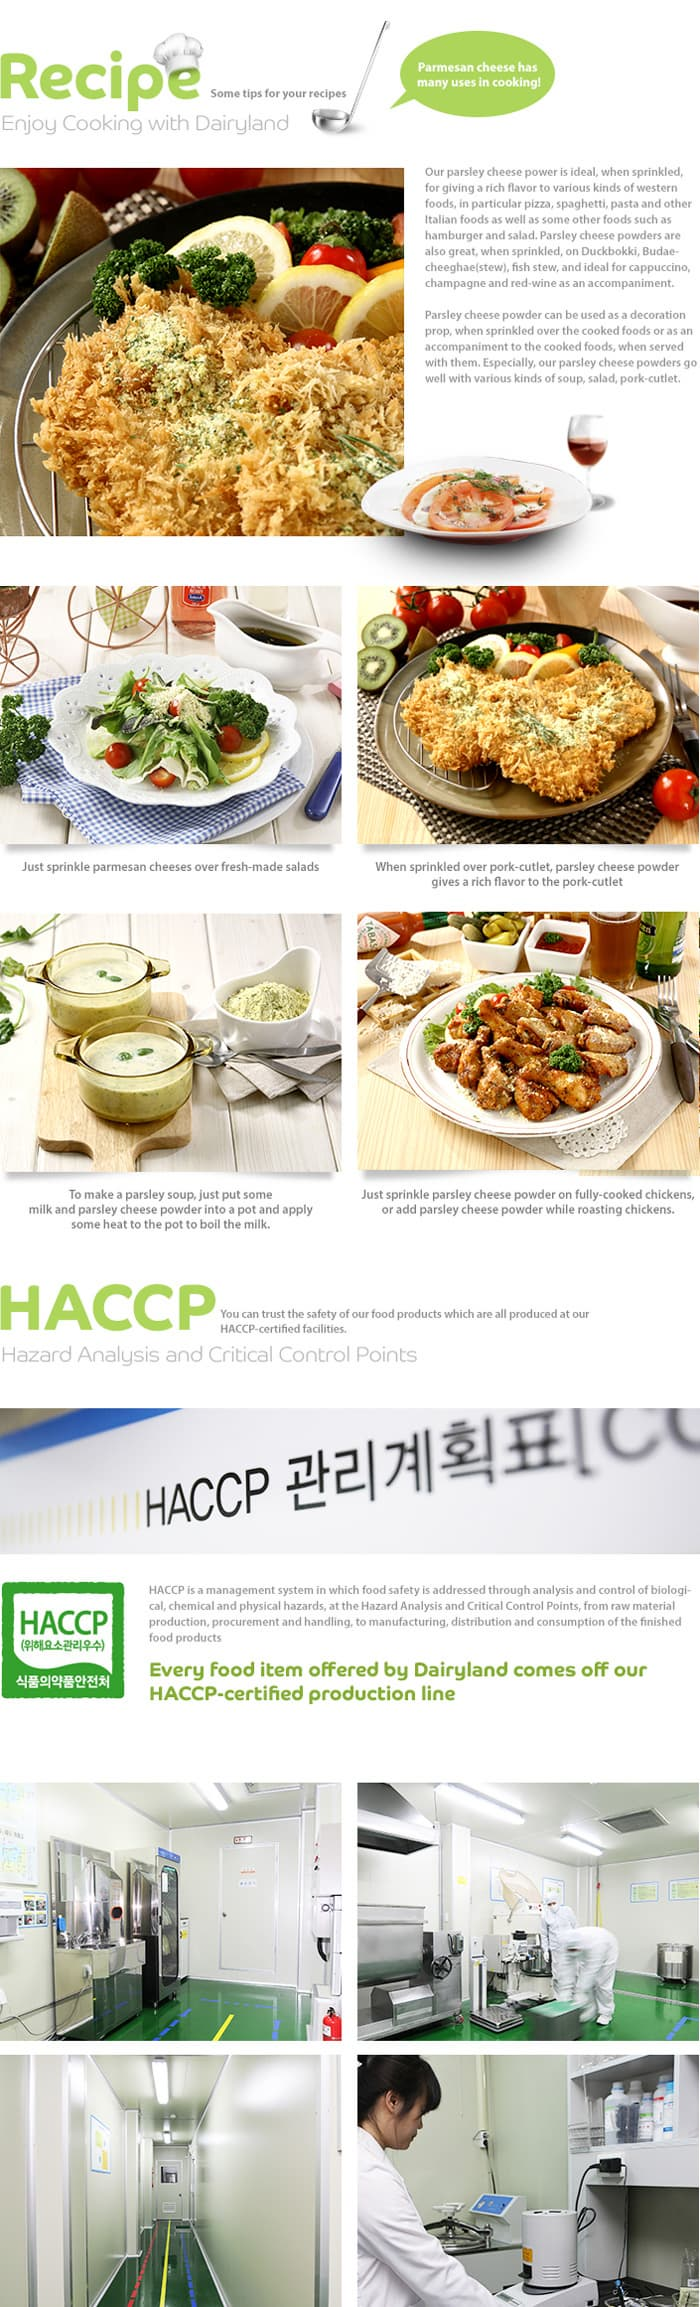 Dairyland Food Service